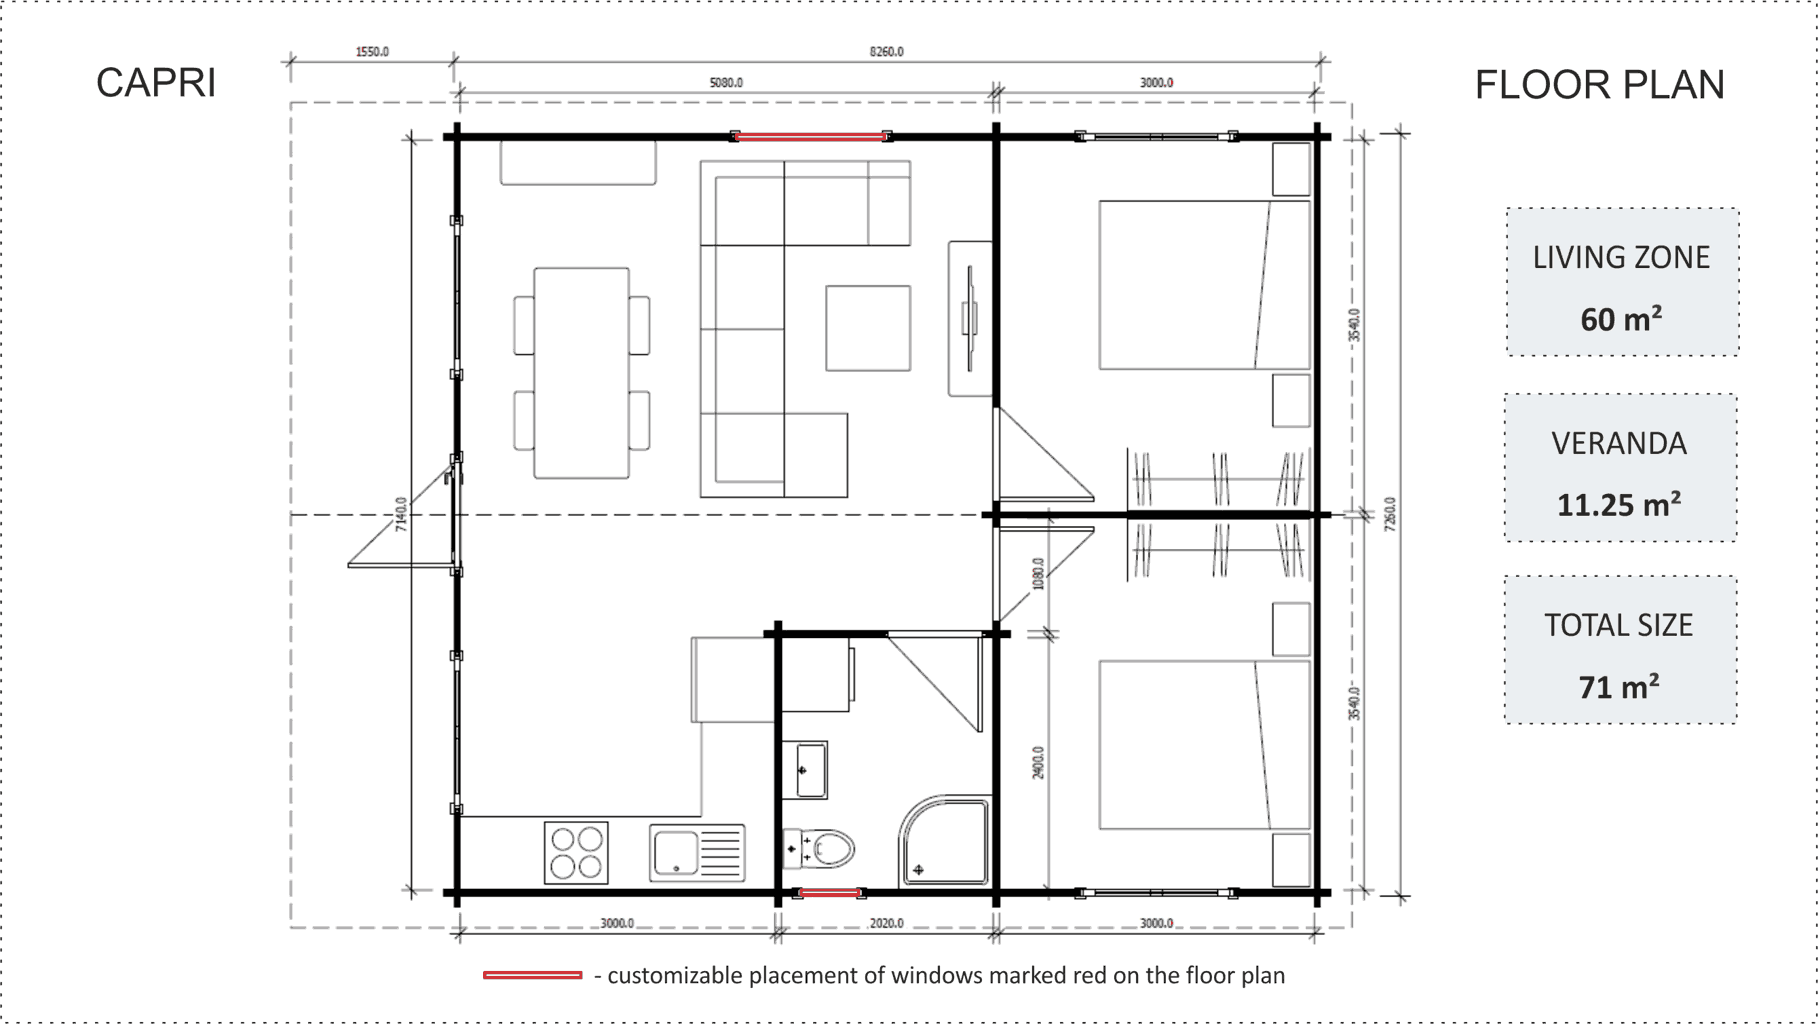 Granny flat Capri floor plan